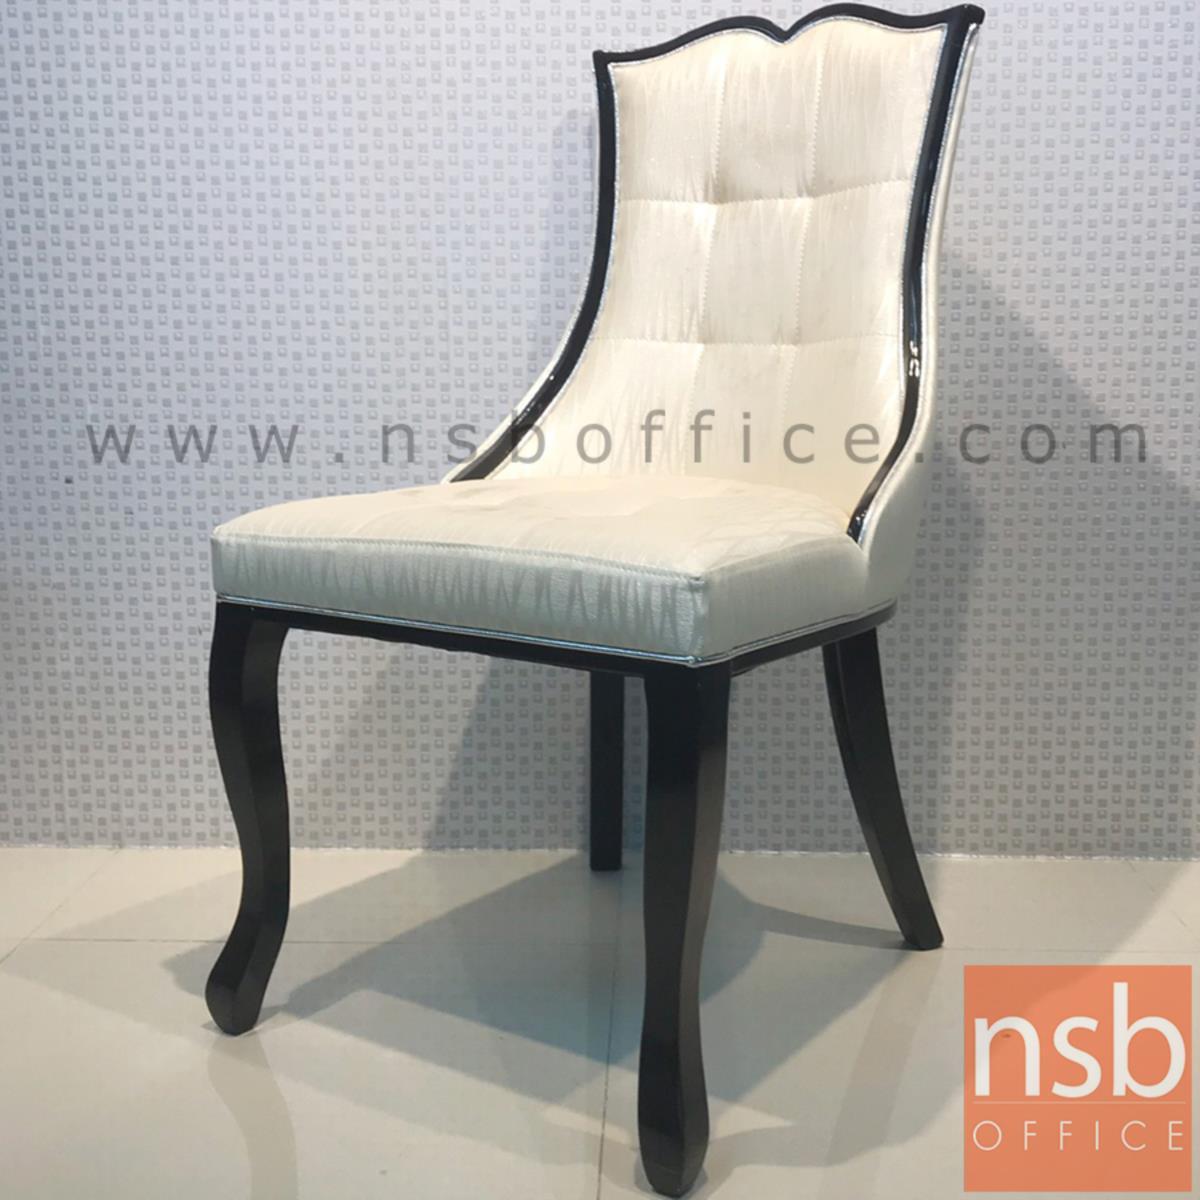 L02A335:เก้าอี้โมเดิร์น ขนาด49W*95H cm. ขาไม้  (STOCK 1 ตัว)